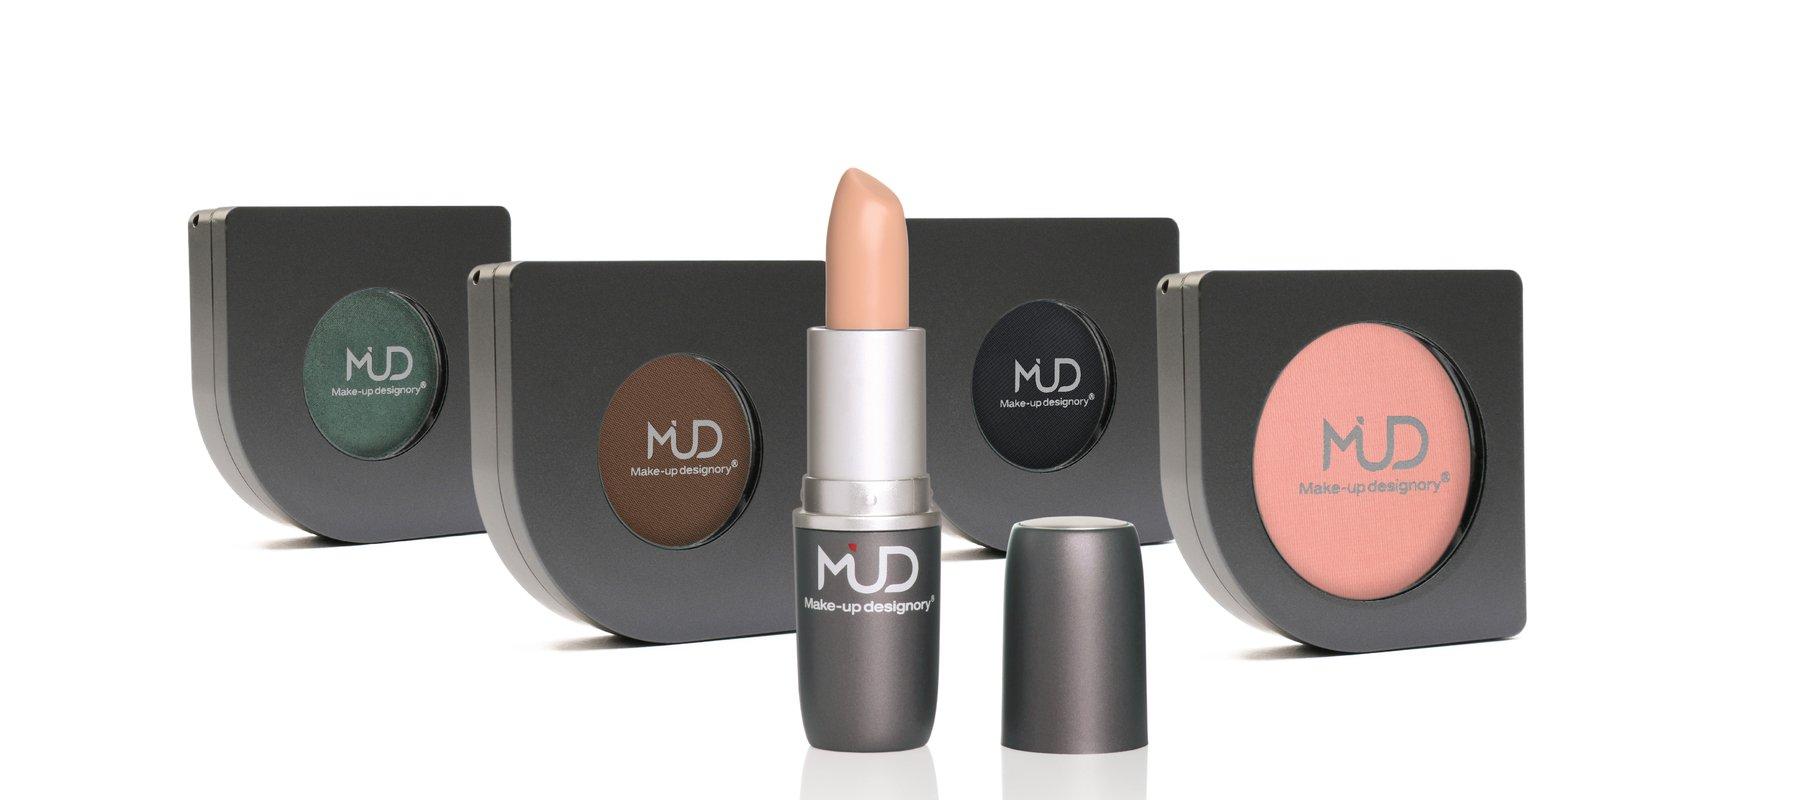 Mud Makeup Designory Kit Saubhaya